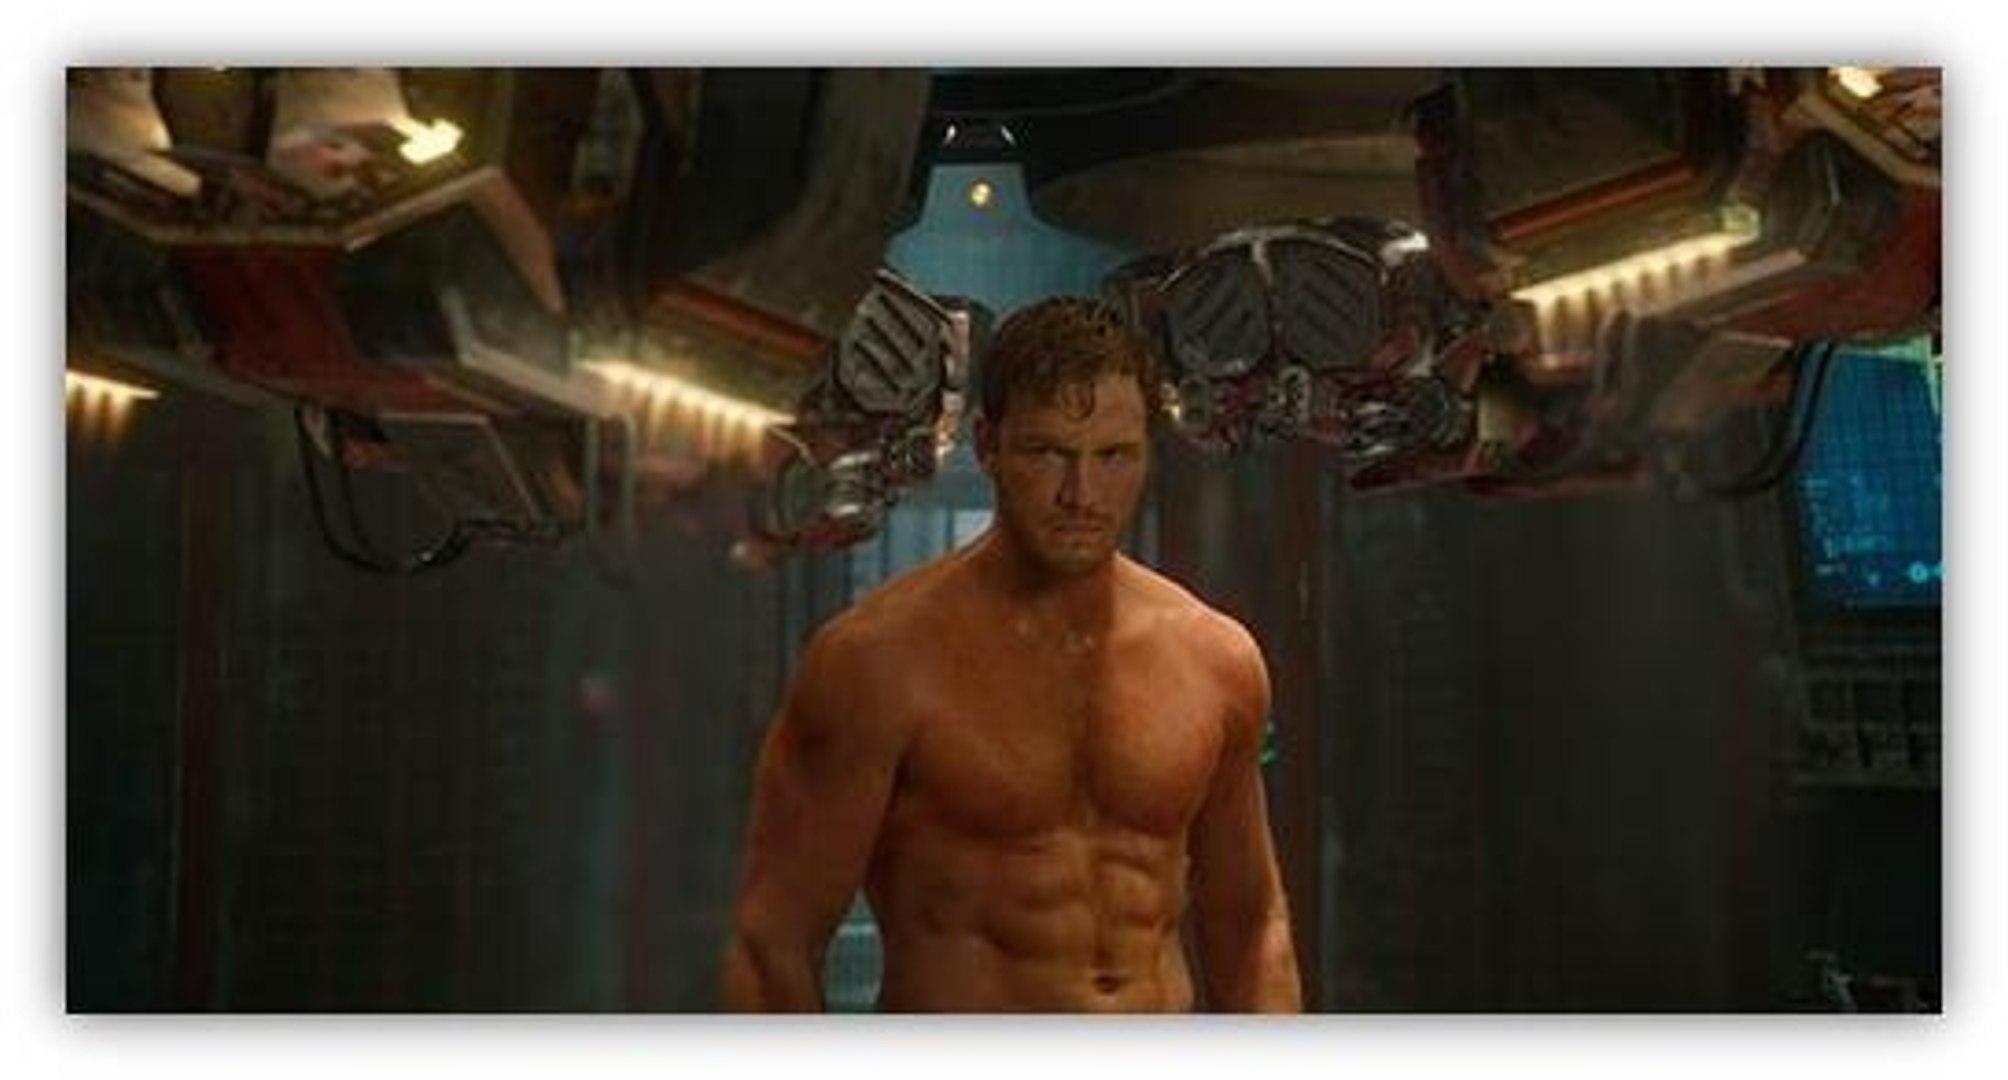 Les Gardiens de la Galaxie - Peter Quill a.k.a. Star-Lord [VOST|HD1080p]